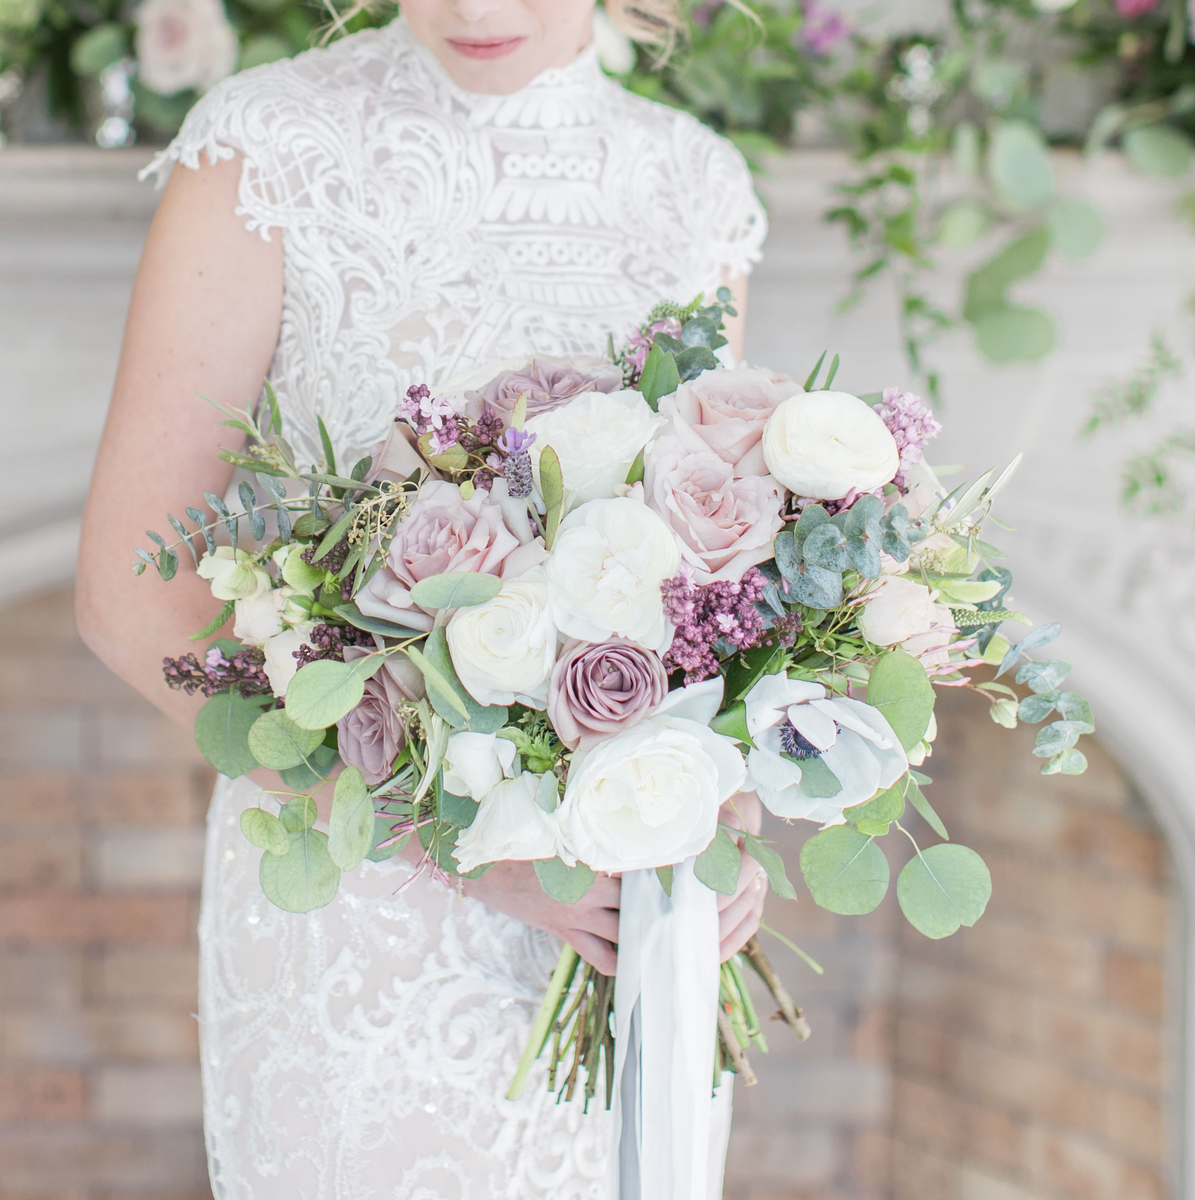 Noblesville Wedding Florists - Reviews for Florists